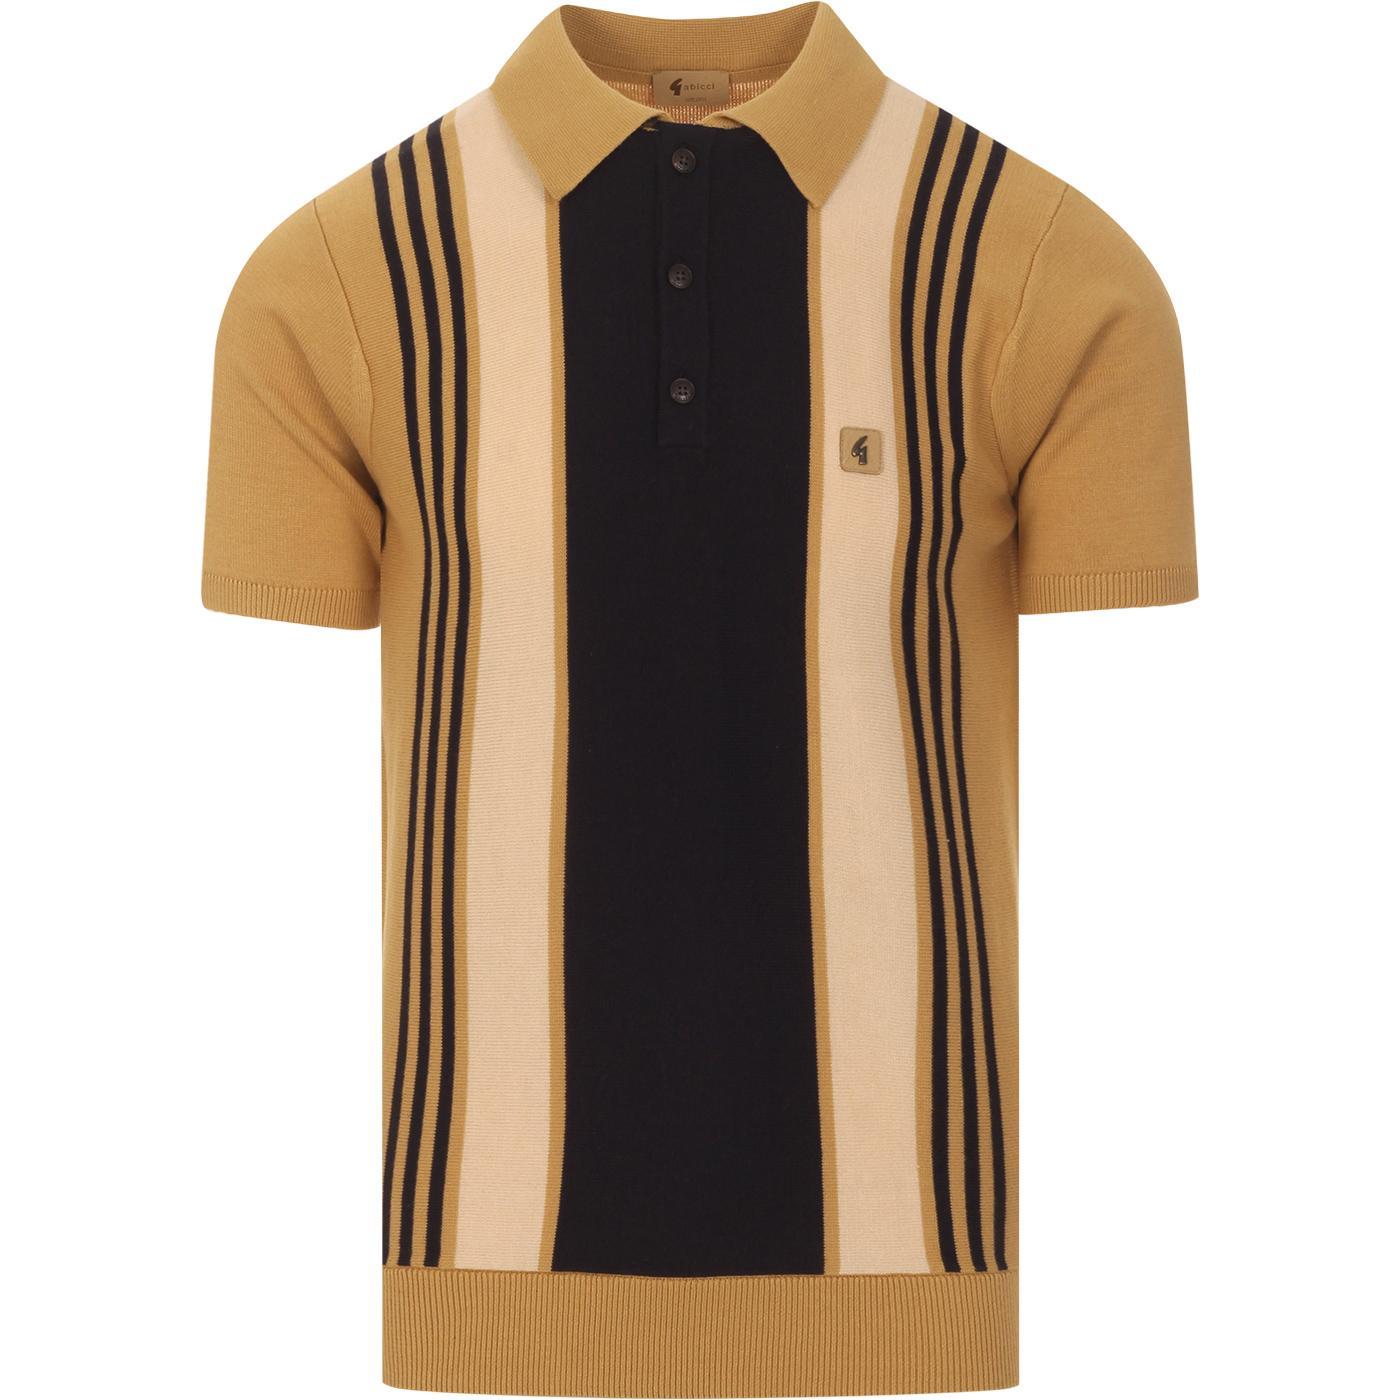 Searle GABICCI VINTAGE Retro Stripe Knit Polo SAND